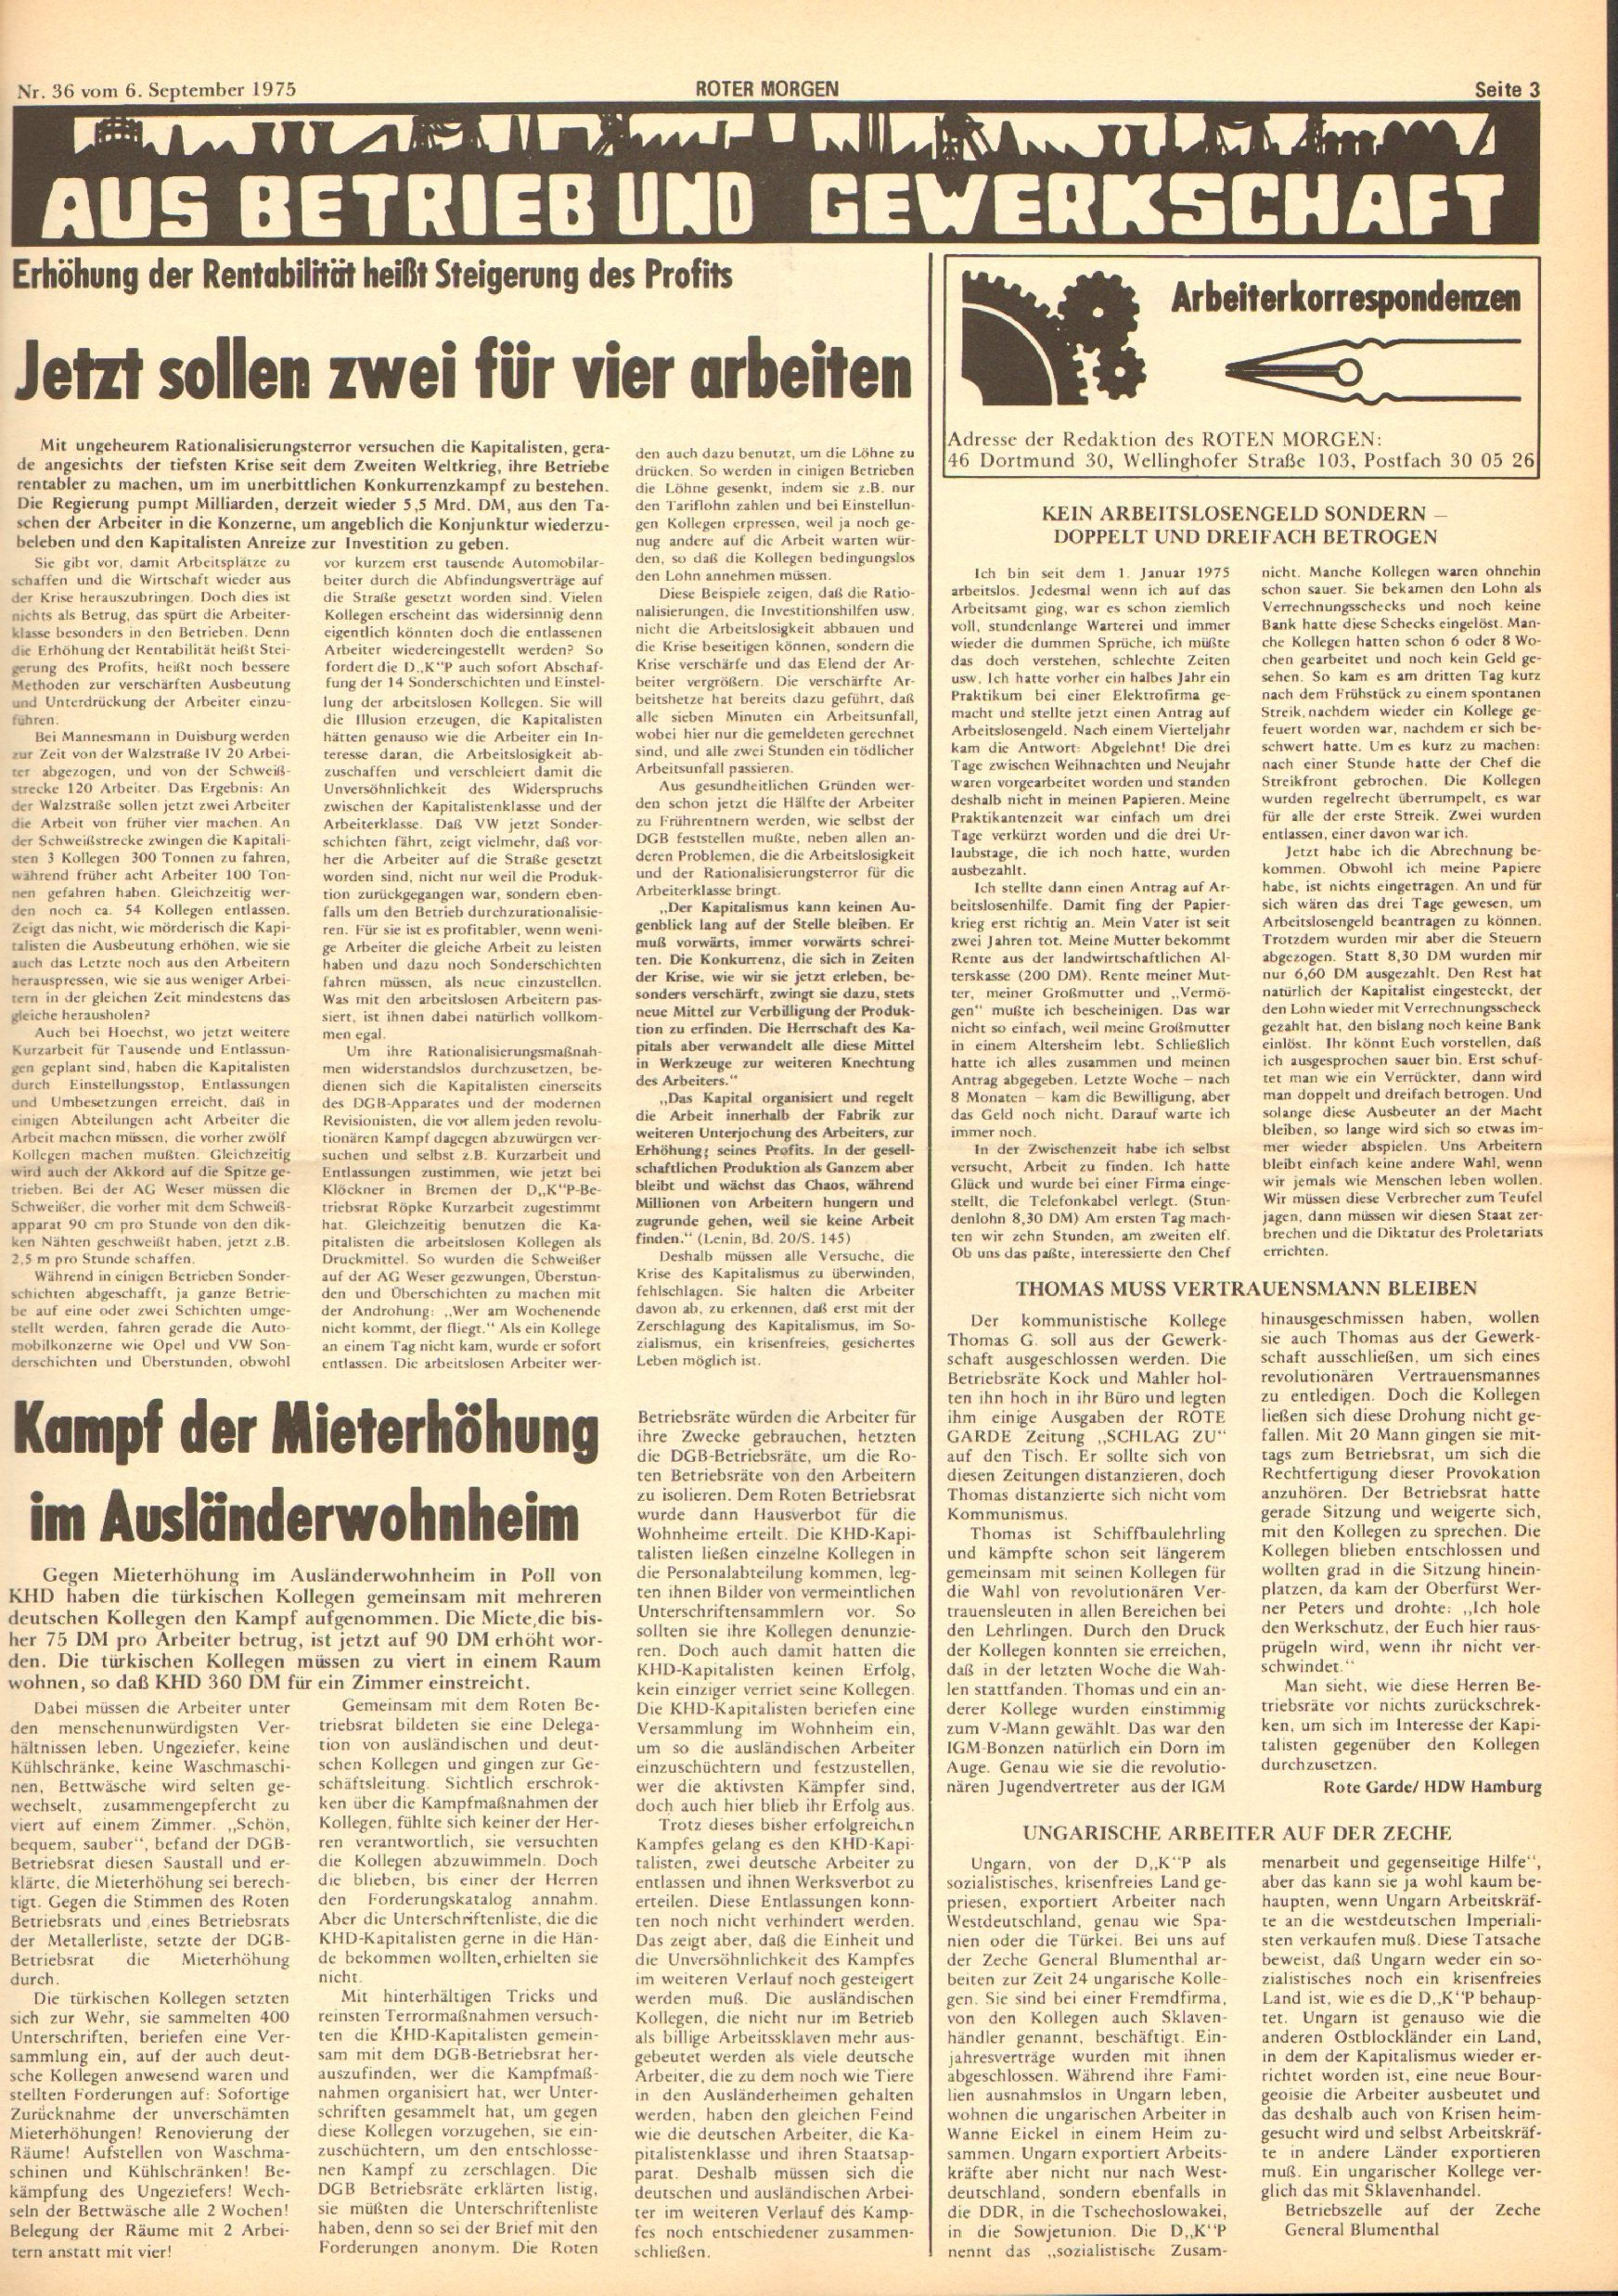 Roter Morgen, 9. Jg., 6. September 1975, Nr. 36, Seite 3